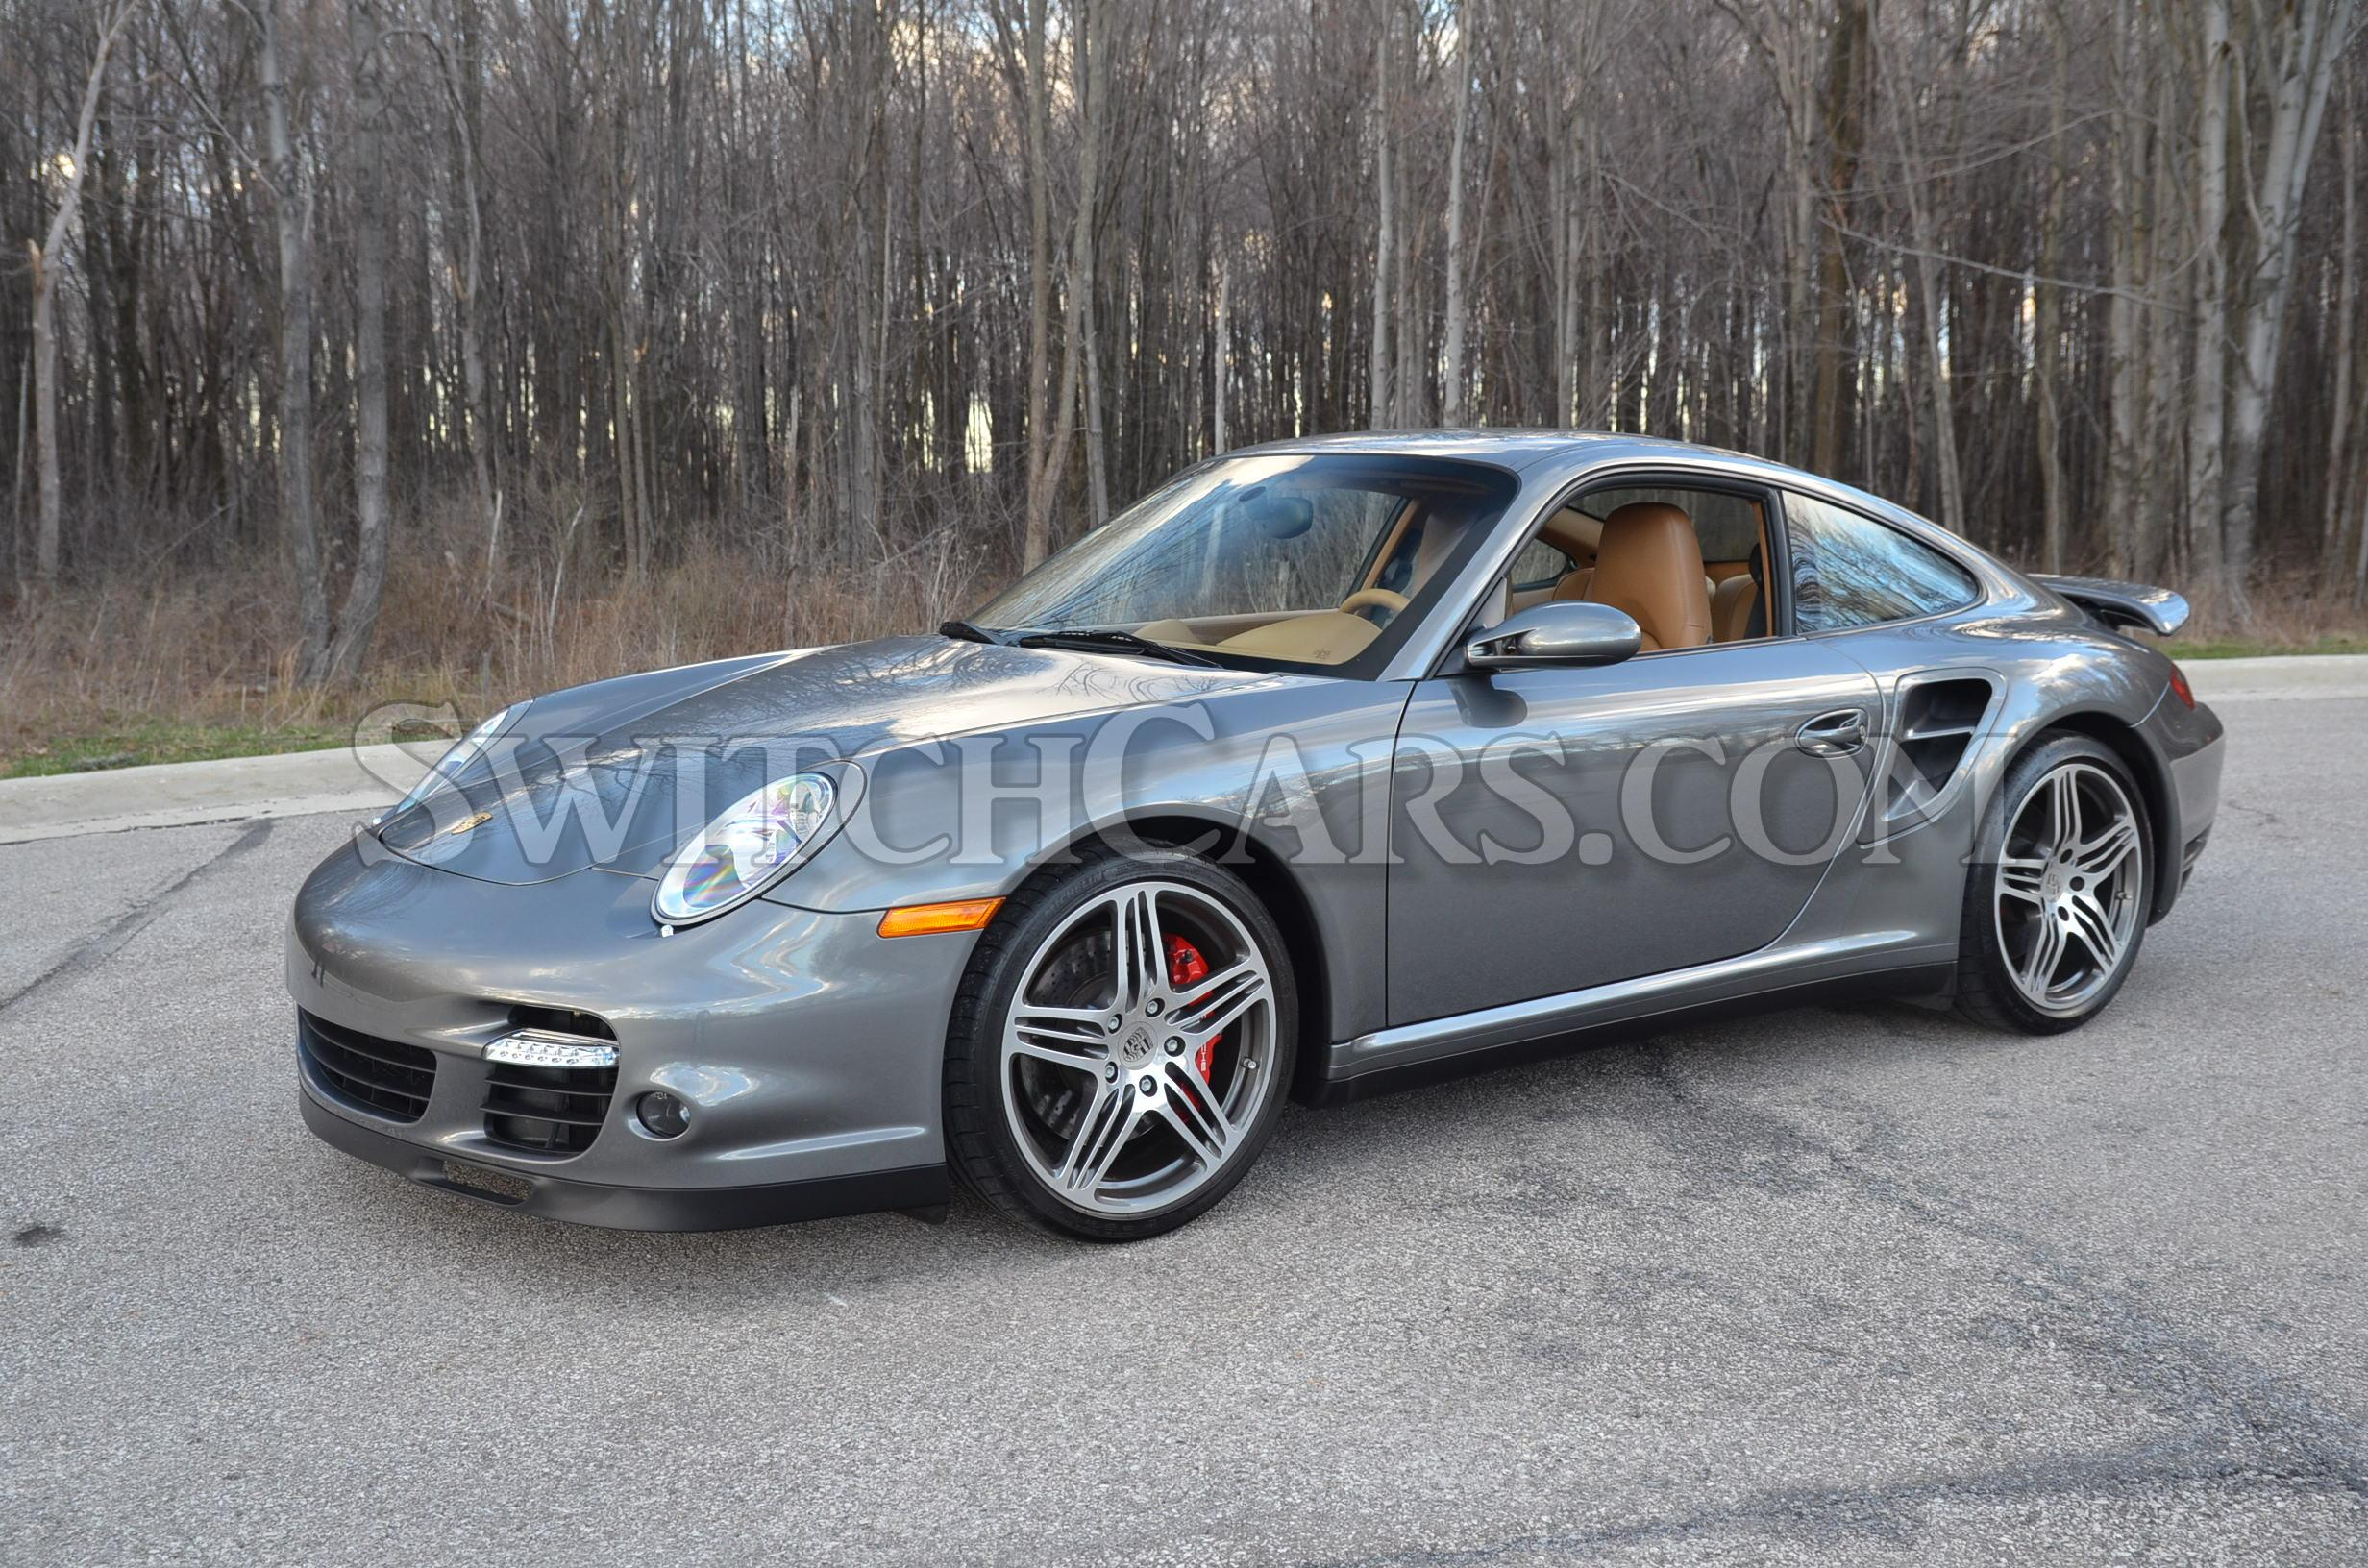 2007 porsche 911 turbo at switchcars inc sold. Black Bedroom Furniture Sets. Home Design Ideas